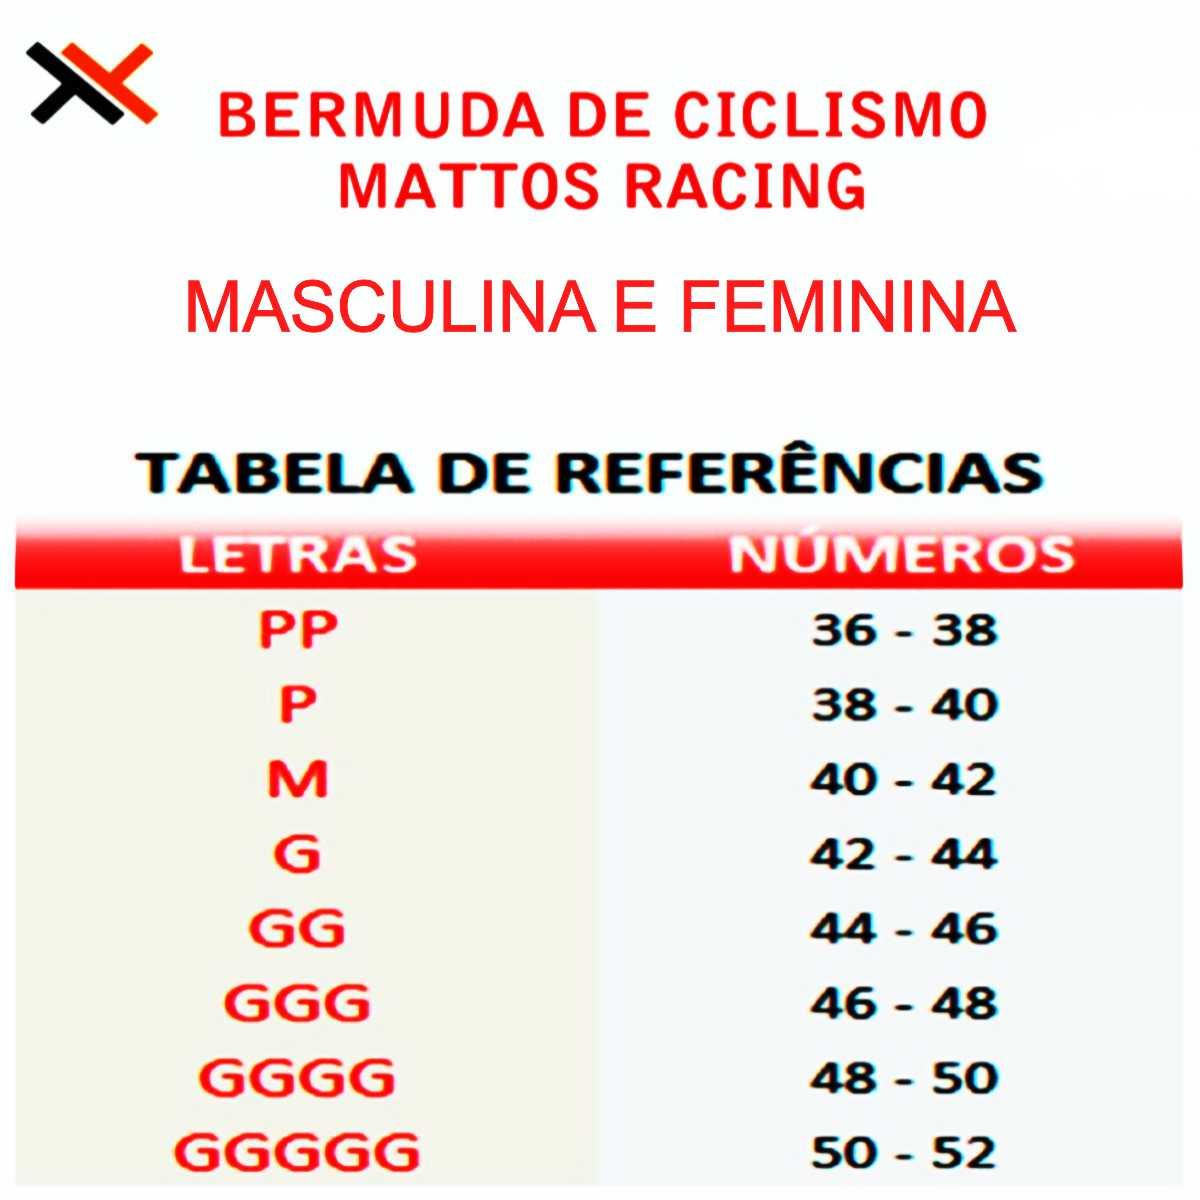 BERMUDA MOUNTAIN BIKE CICLISTA MATTOS RACING MTB TRILHA FORRO GEL ALTA DENSIDADE MASCULINO FEMININA